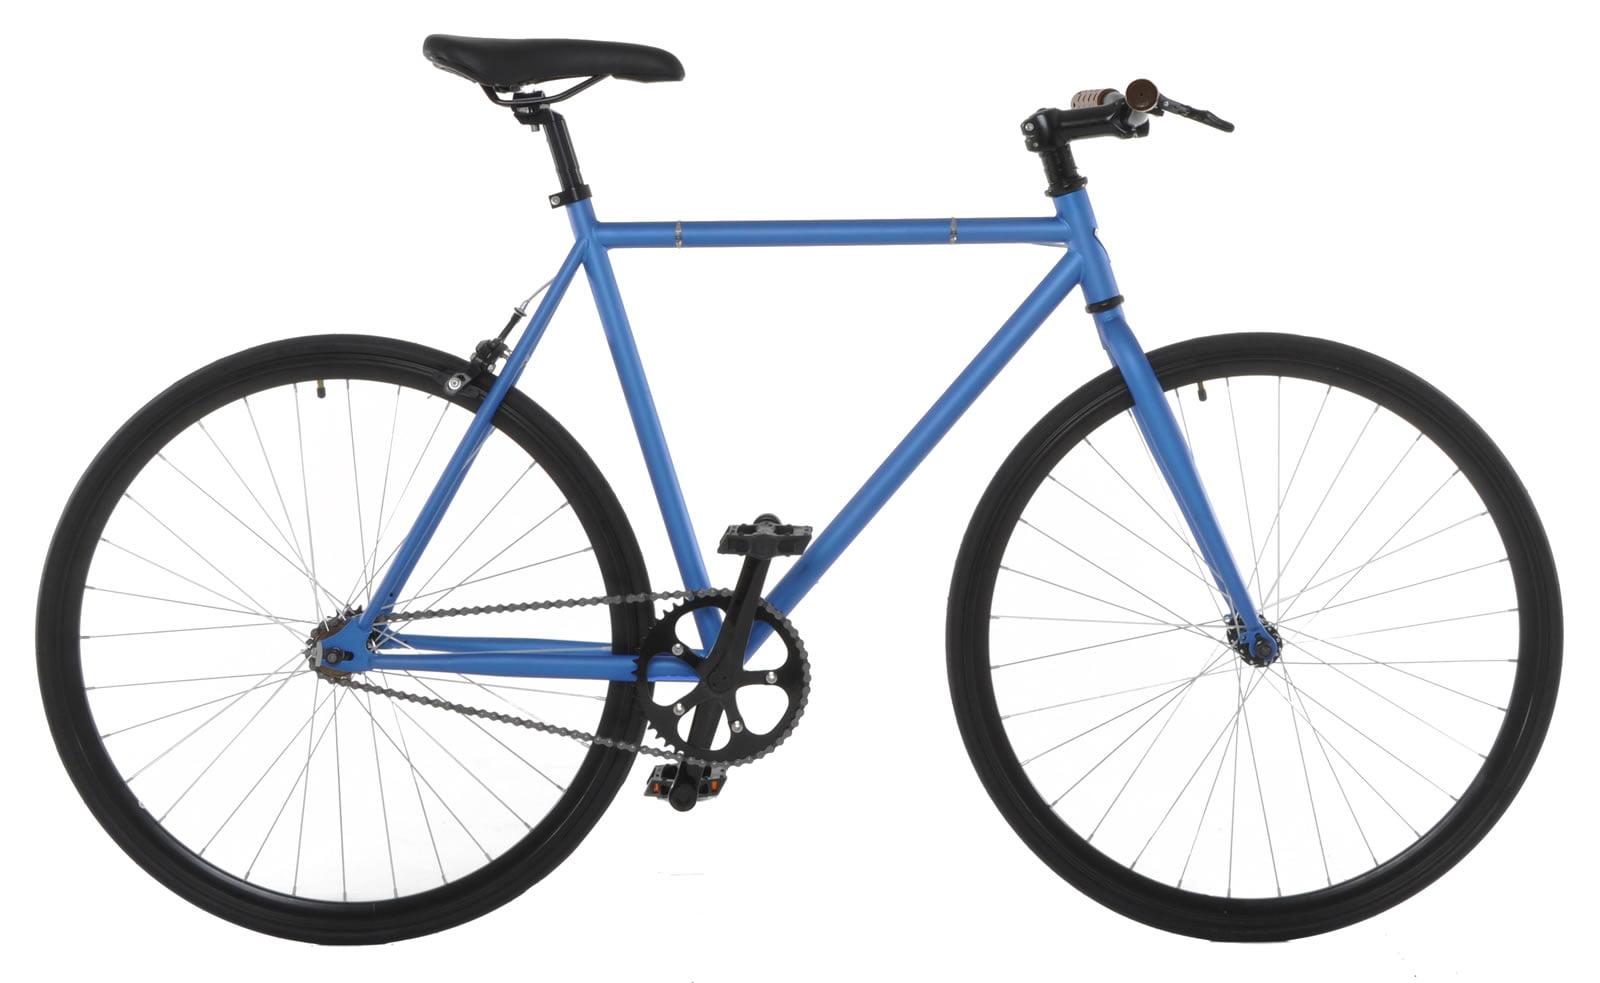 Vilano Fixed Gear Bike Fixie Single Speed Road Bike - Walmart.com